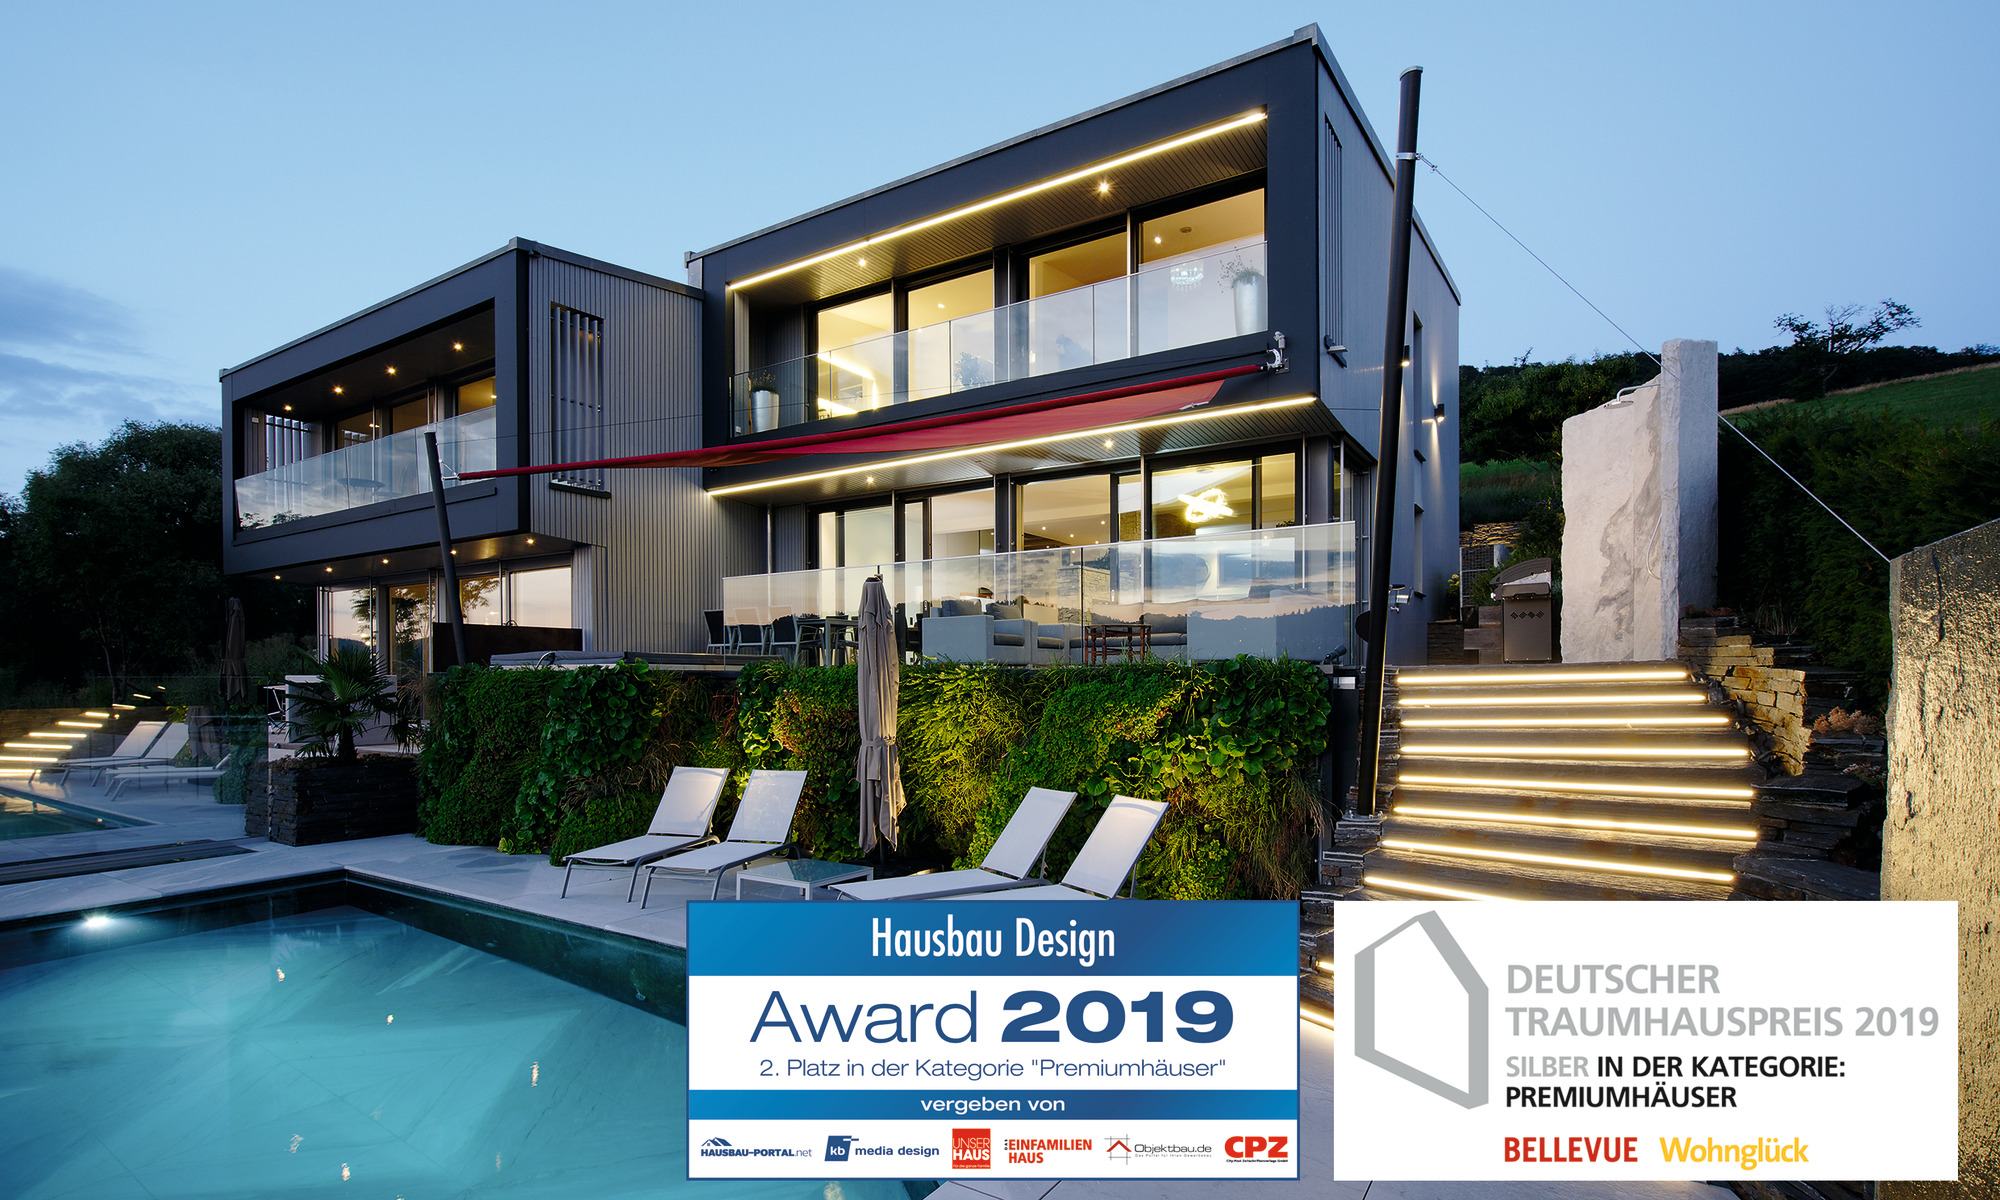 Hausbau Design Award 2019 für WeberHaus